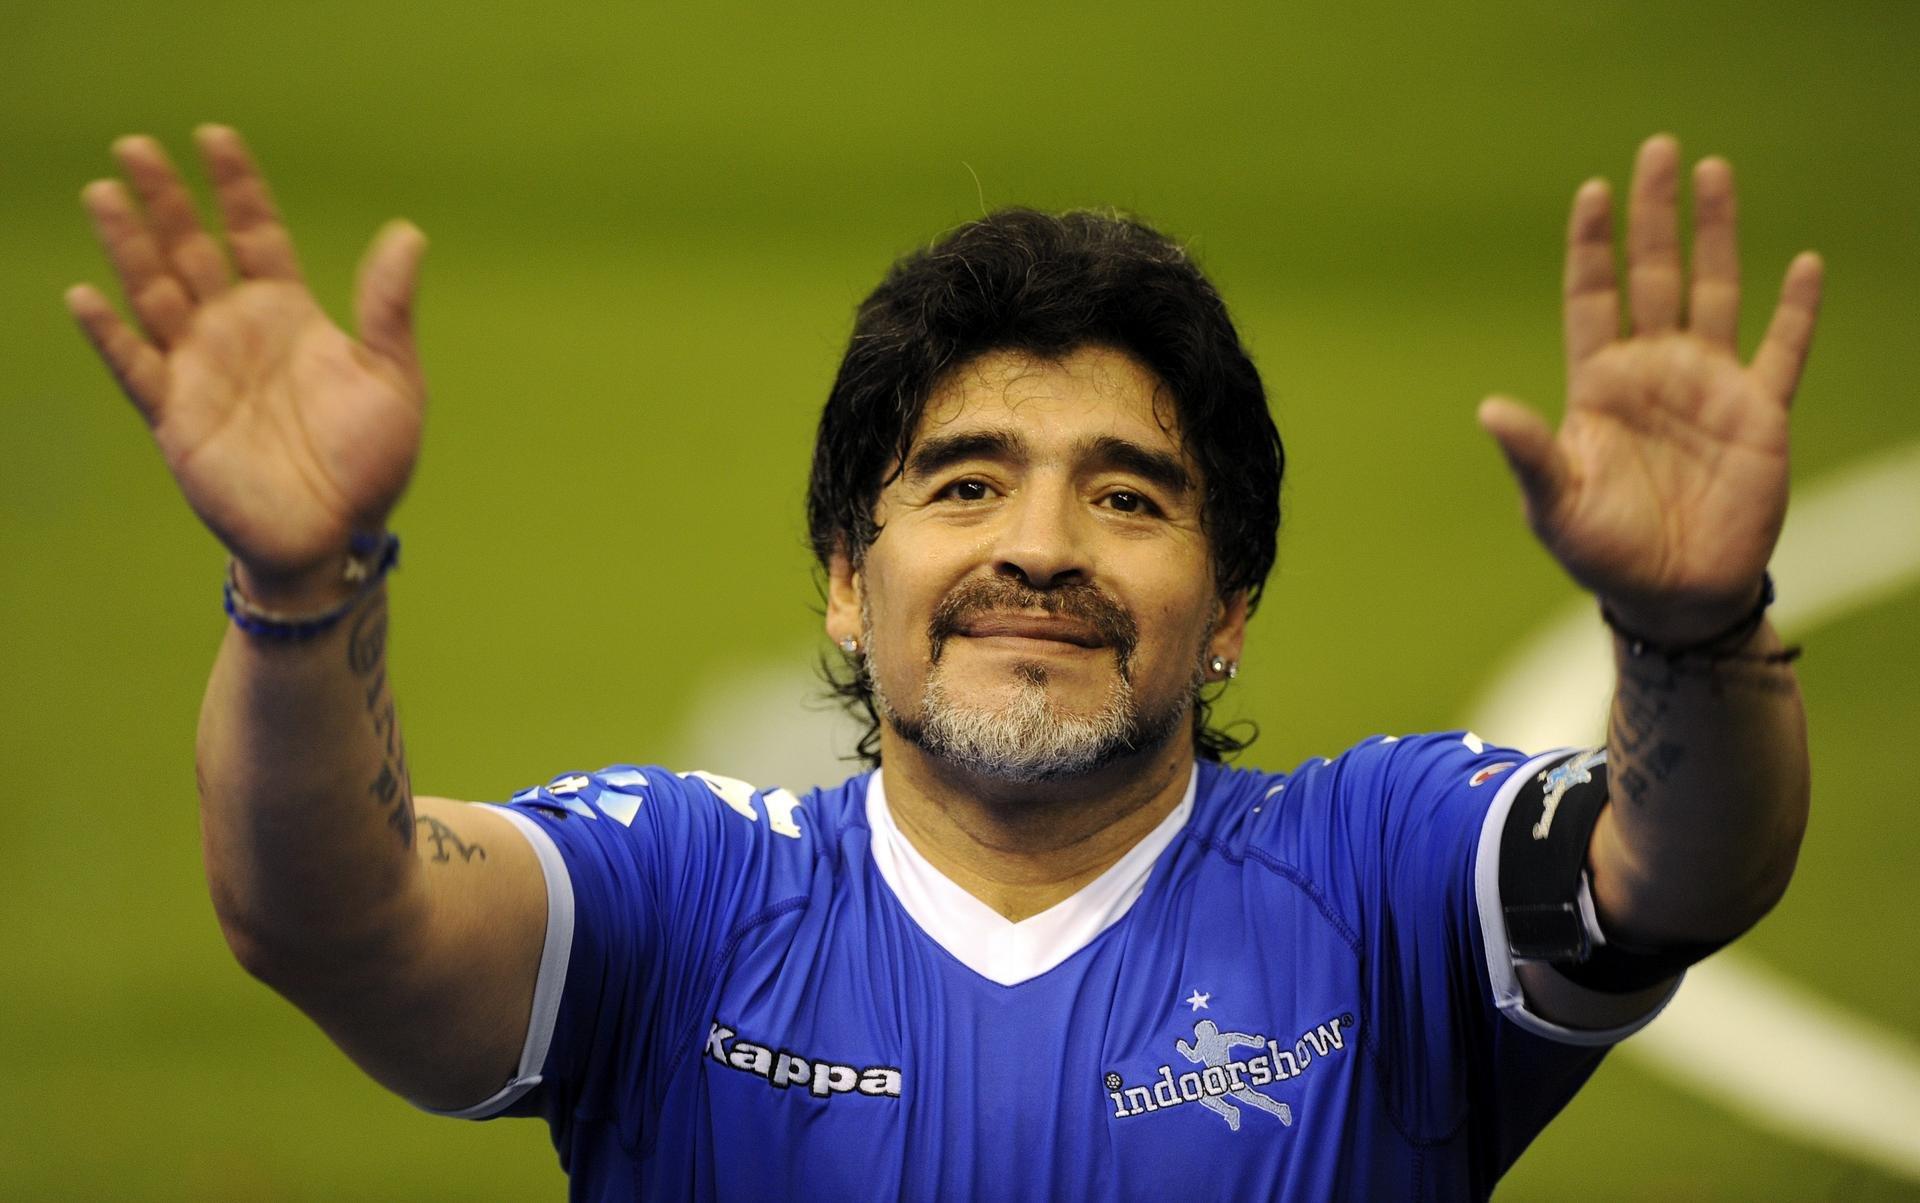 Diego Maradona quer processar a Konami - NerdBunker